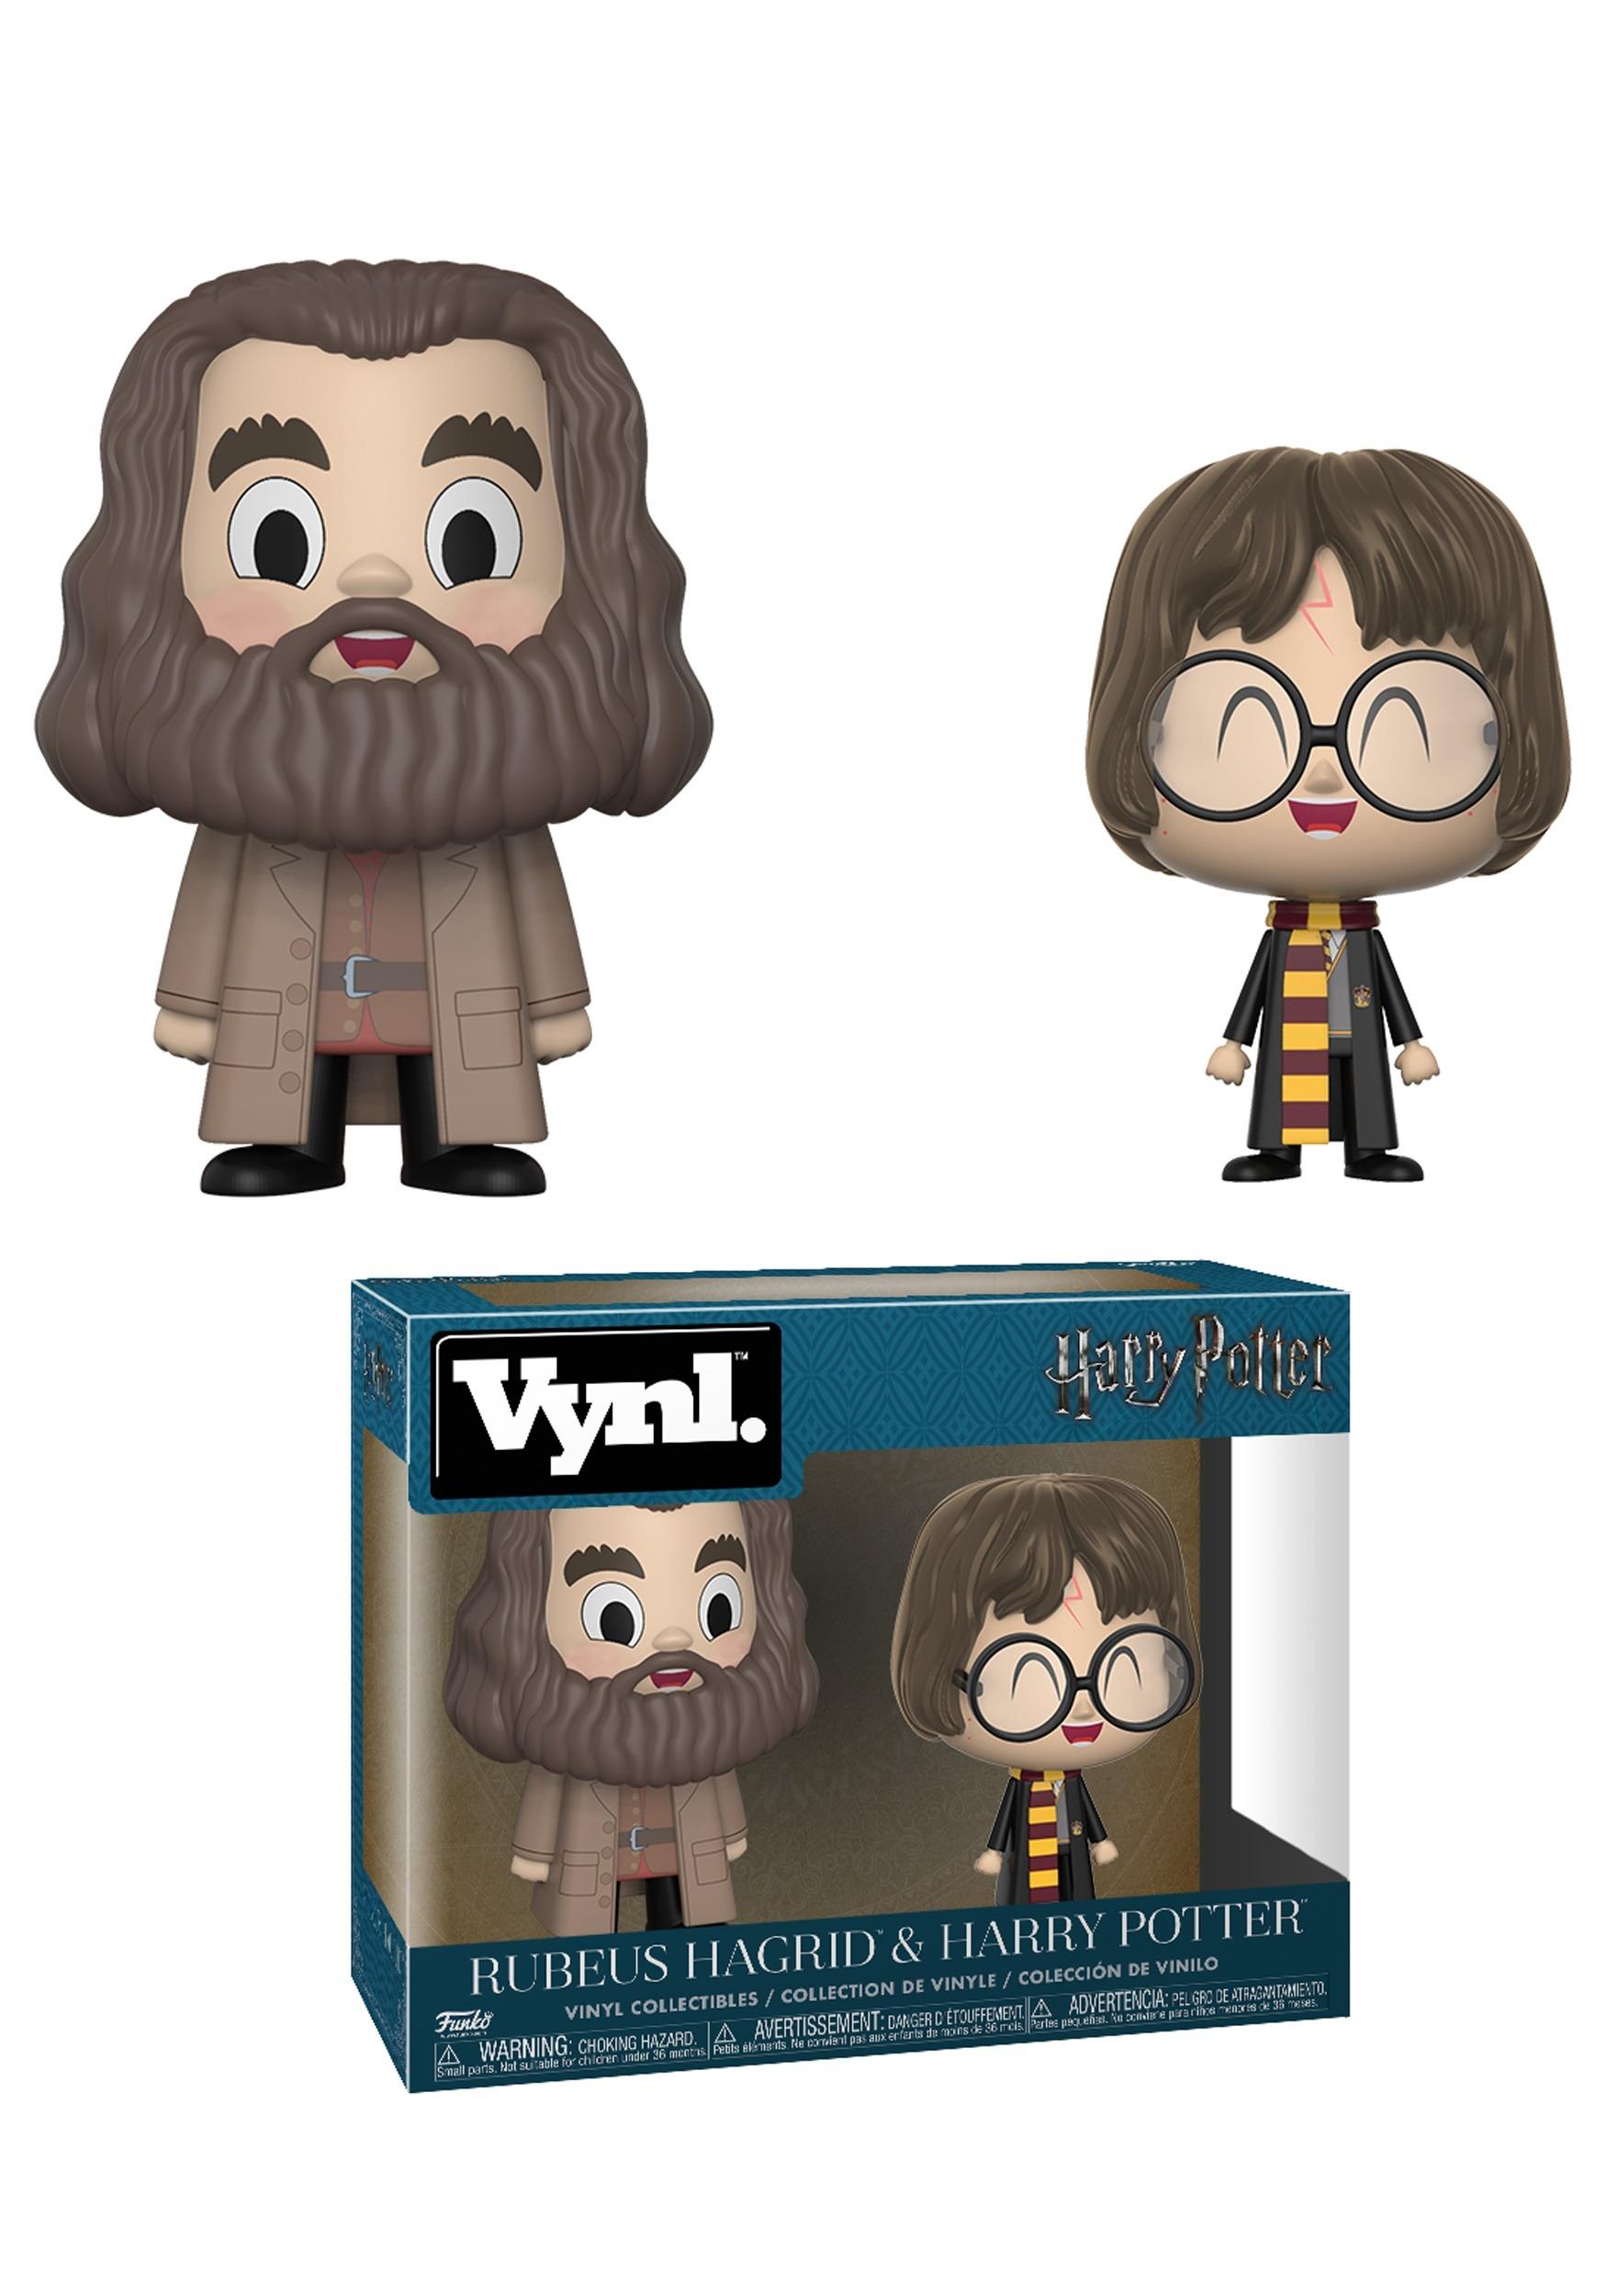 Vnyl: Harry Potter: Rubeus Hagrid & Harry Potter Figures FN26524